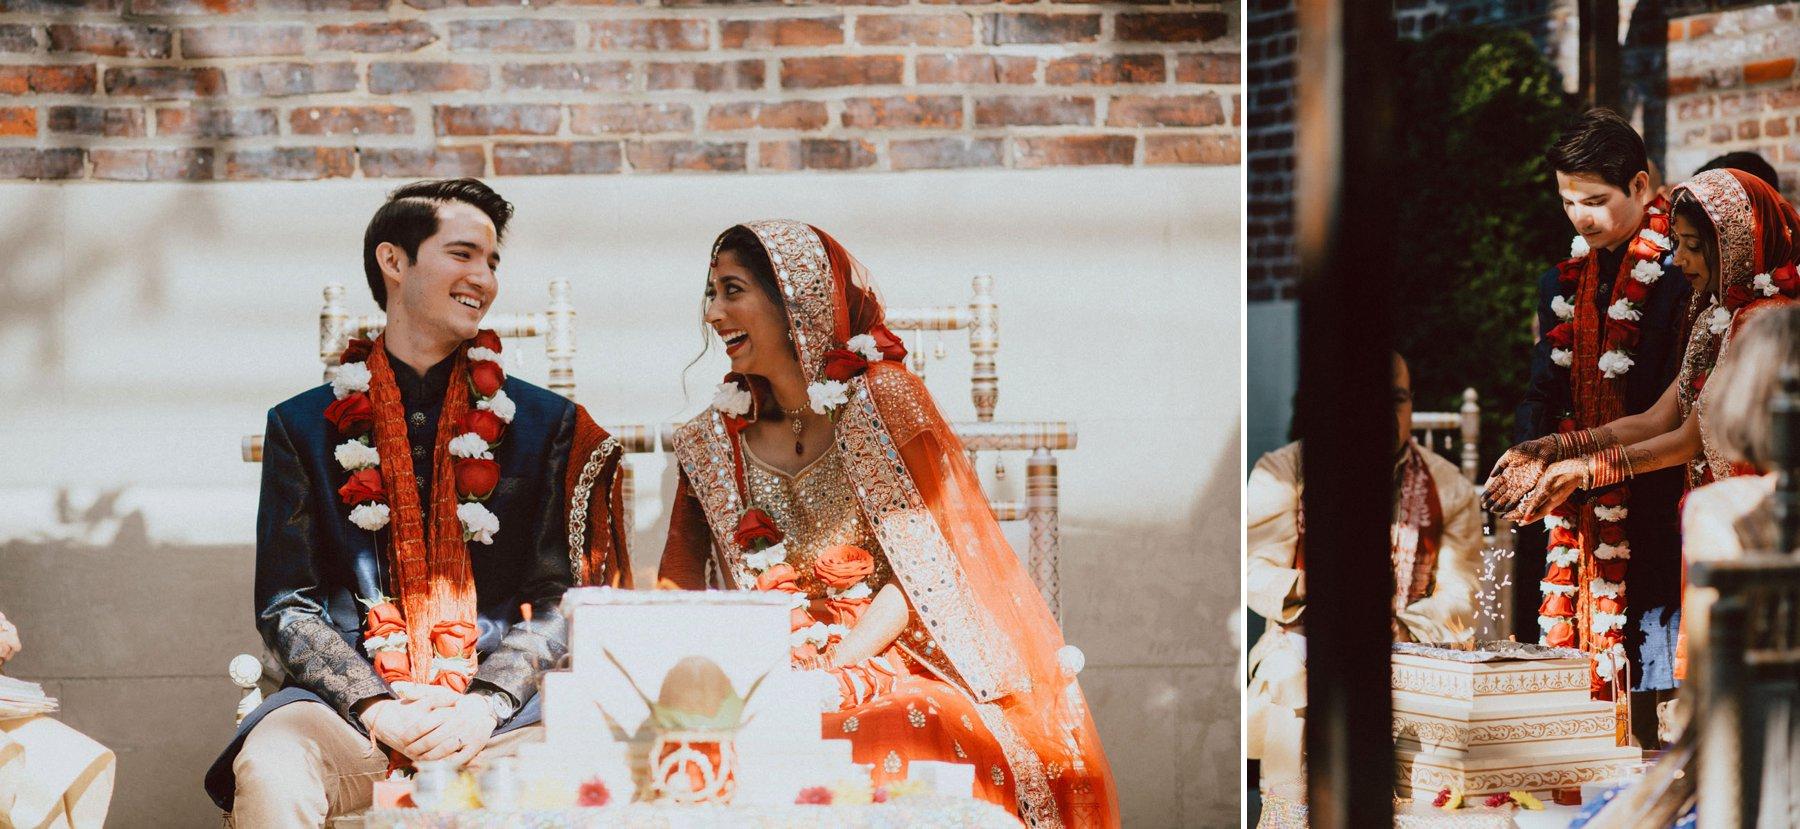 vie-philadelphia-indian-wedding-83.jpg